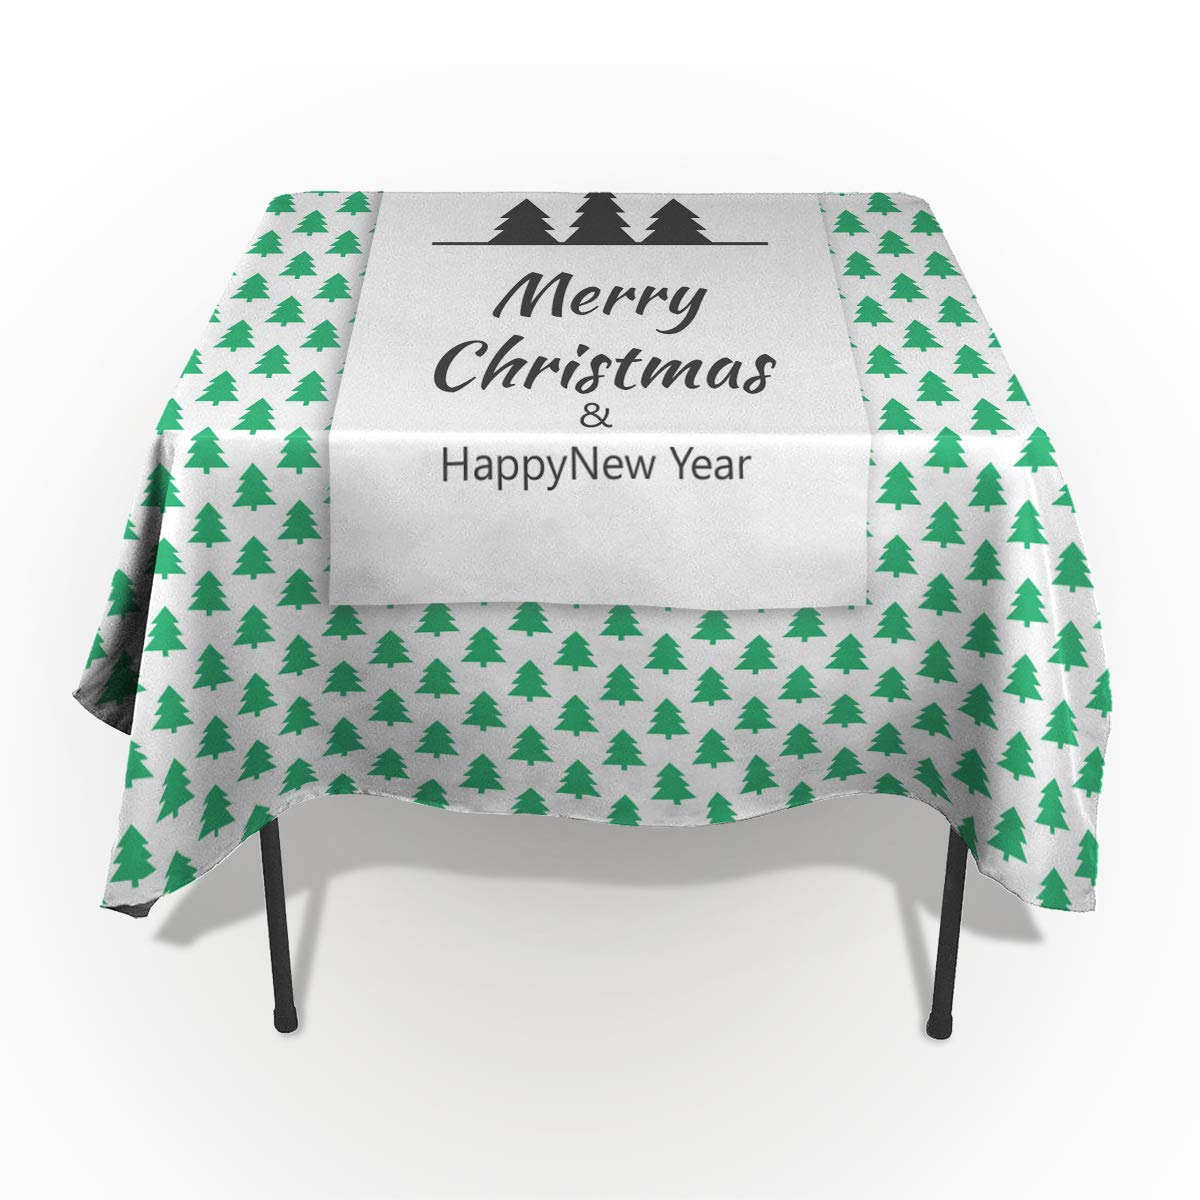 Fantasy Star 長方形ポリエステルテーブルクロス クリスマス 赤 白 ストライプ 洗濯機洗い可能 テーブルカバー 装飾テーブルクロス キッチン ダイニング 宴会 パーティー 60